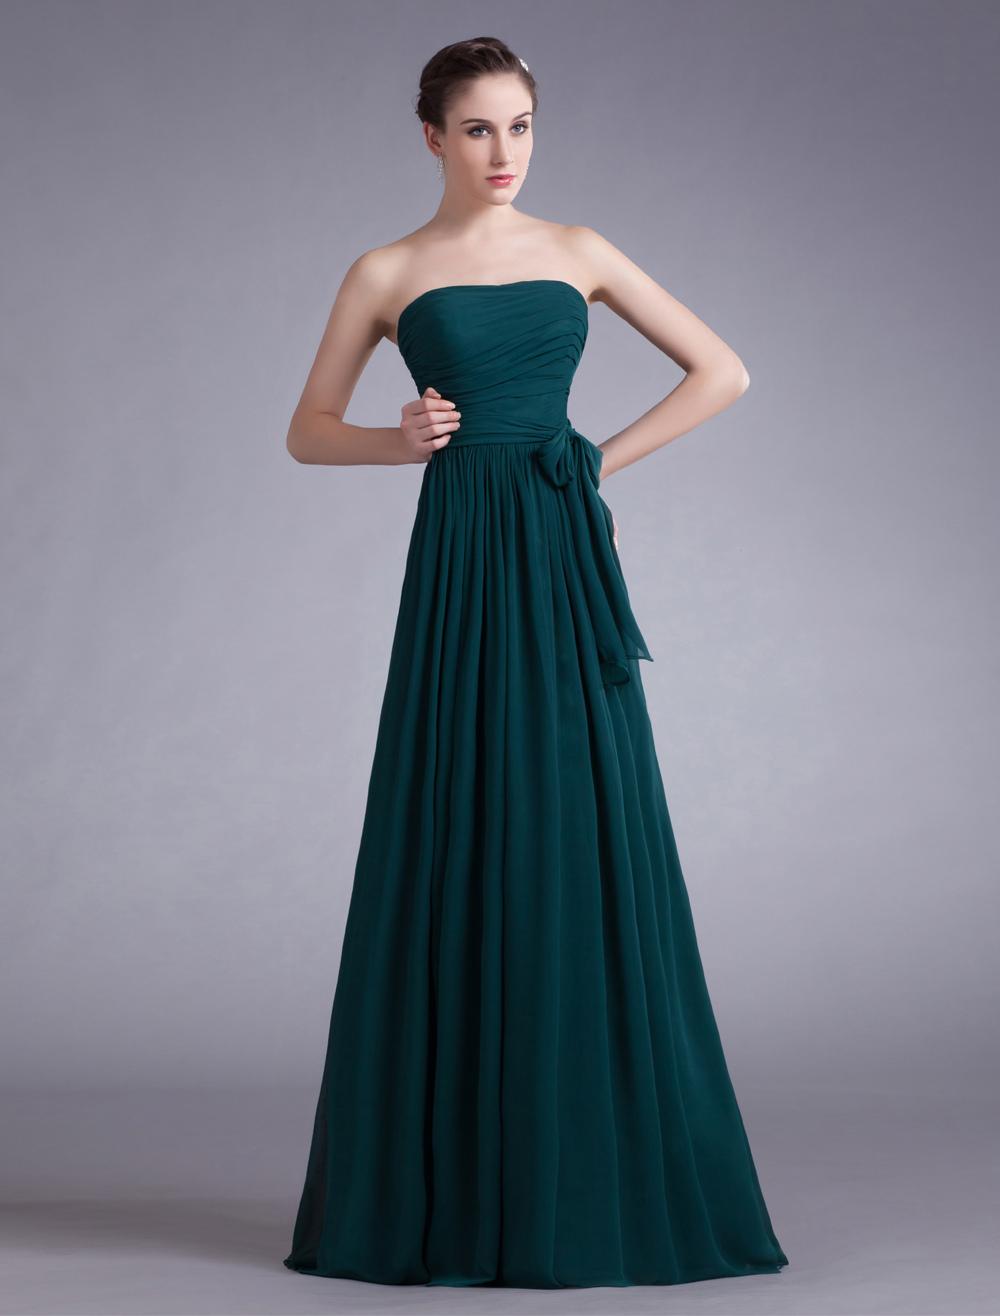 Dark Green Chiffon Strapless Evening Dress (Wedding Evening Dresses) photo